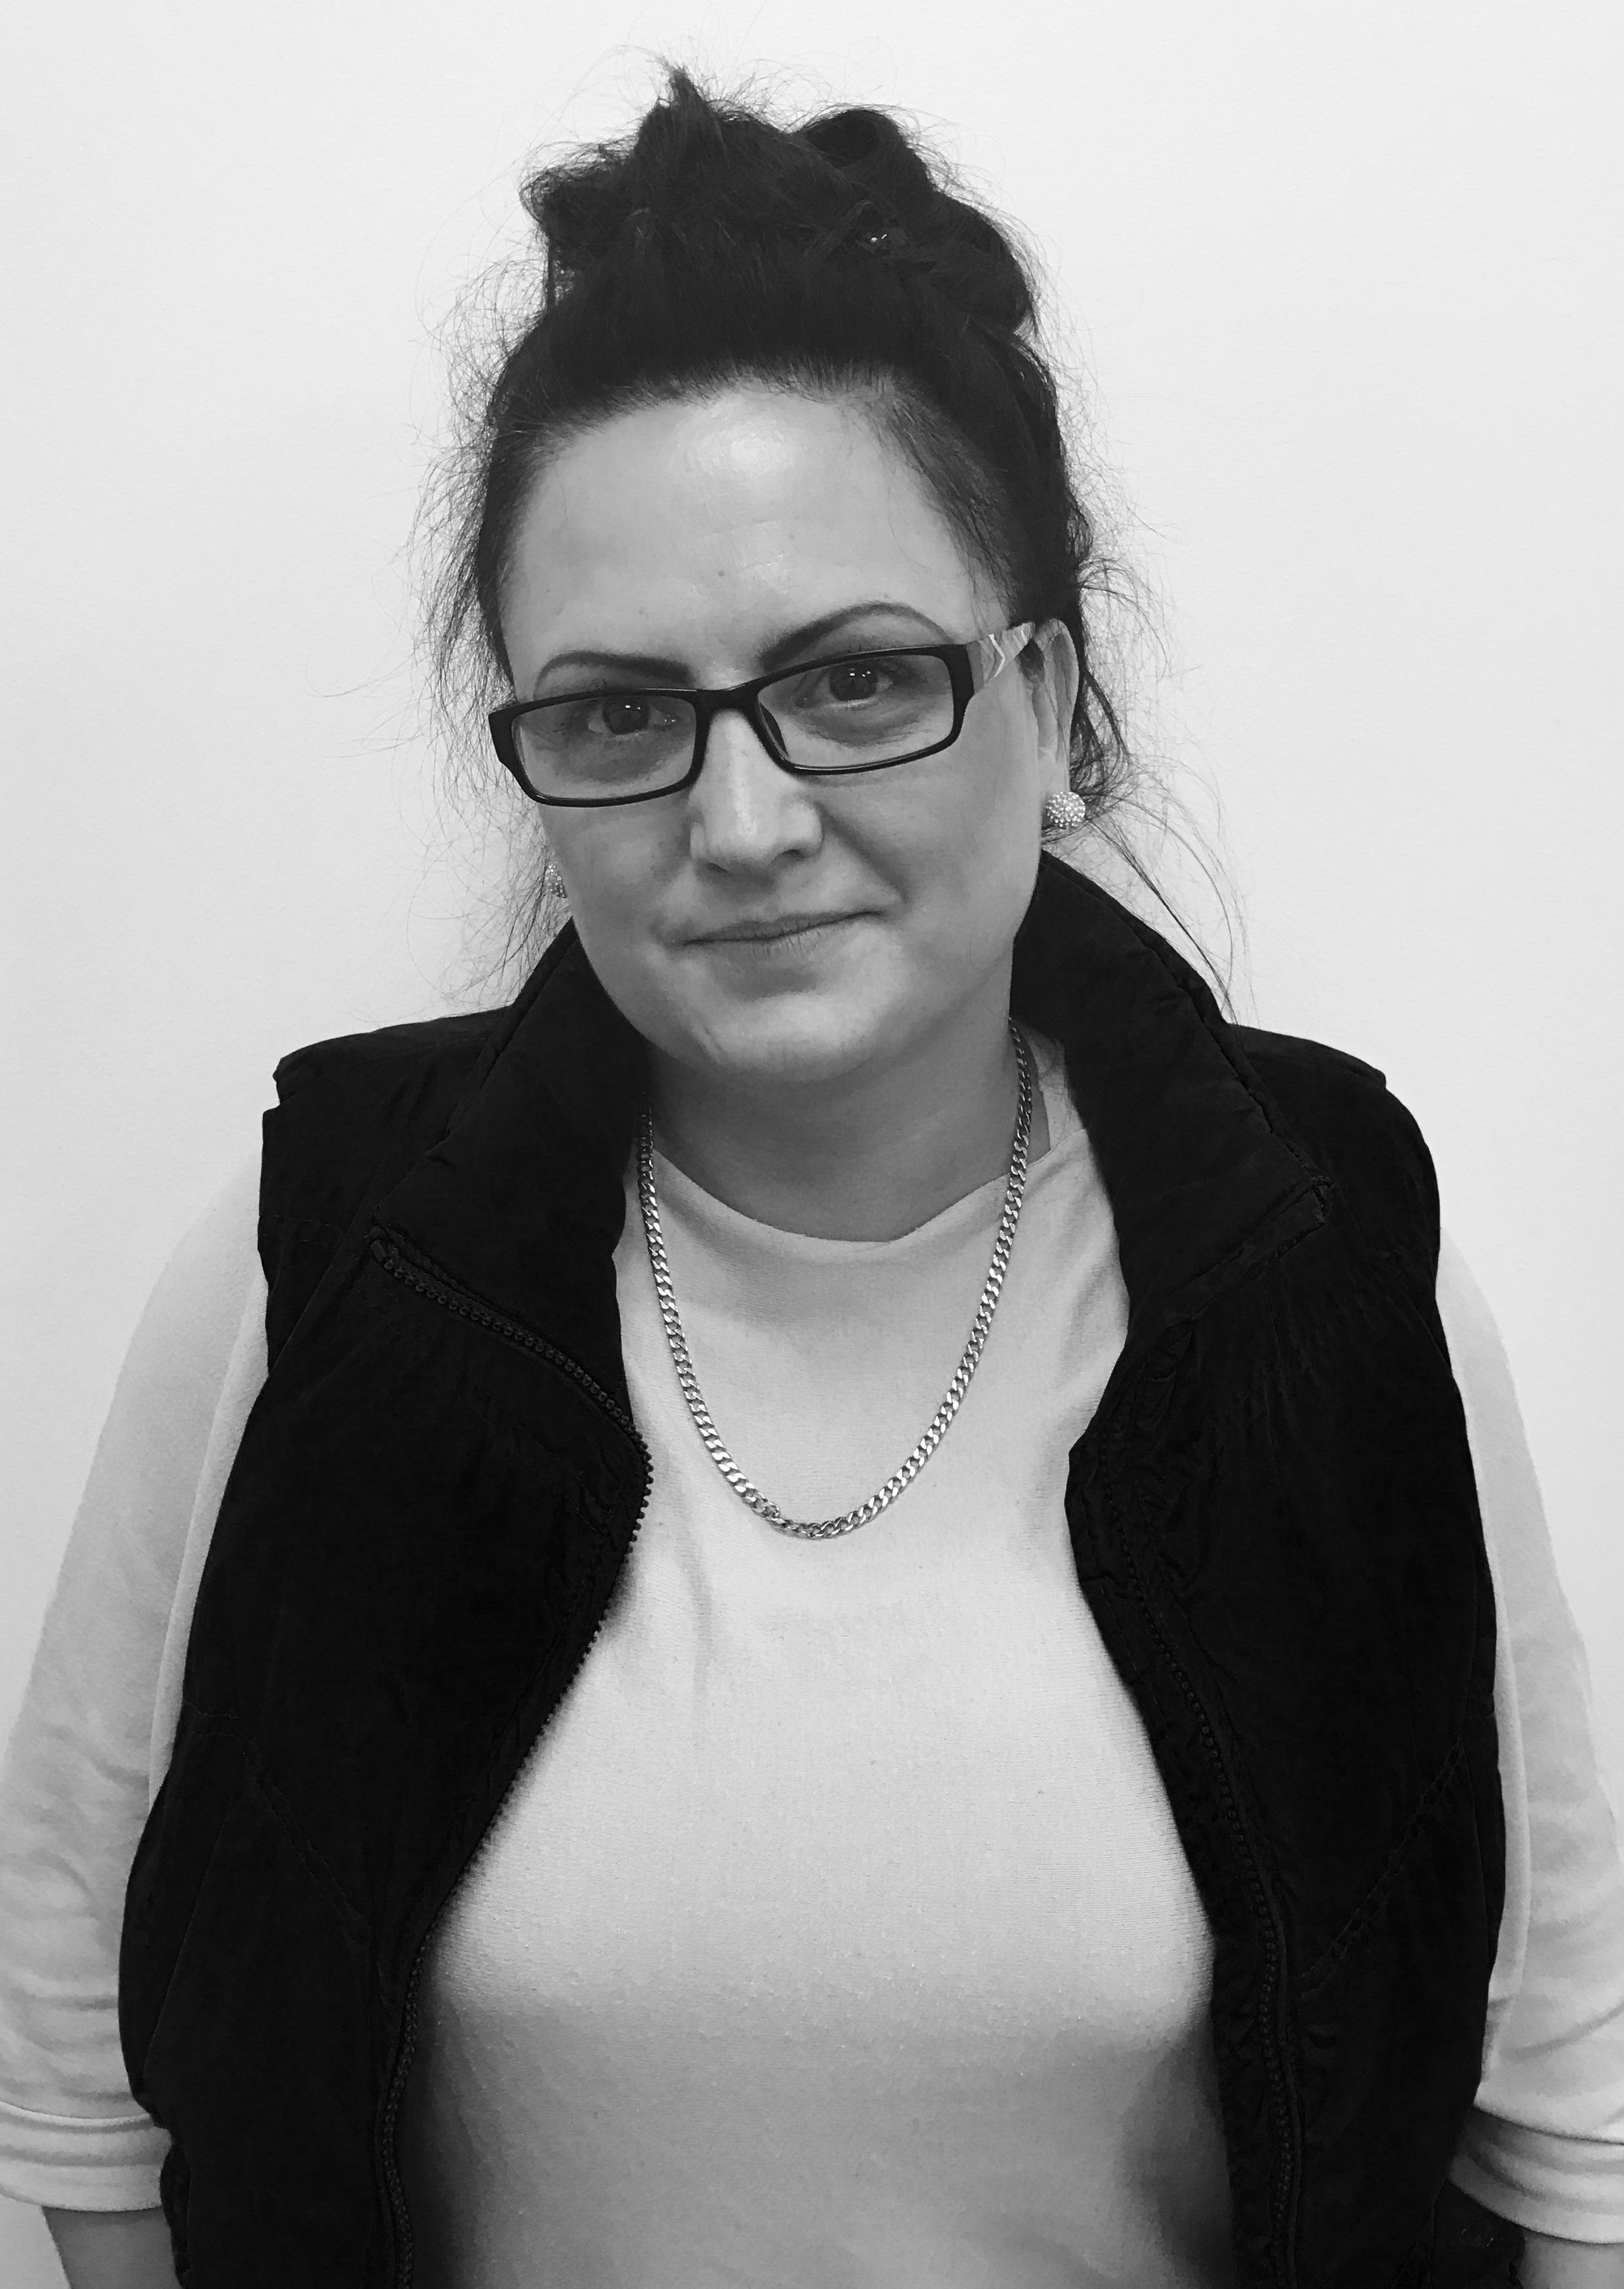 Magdalena Piatkowska